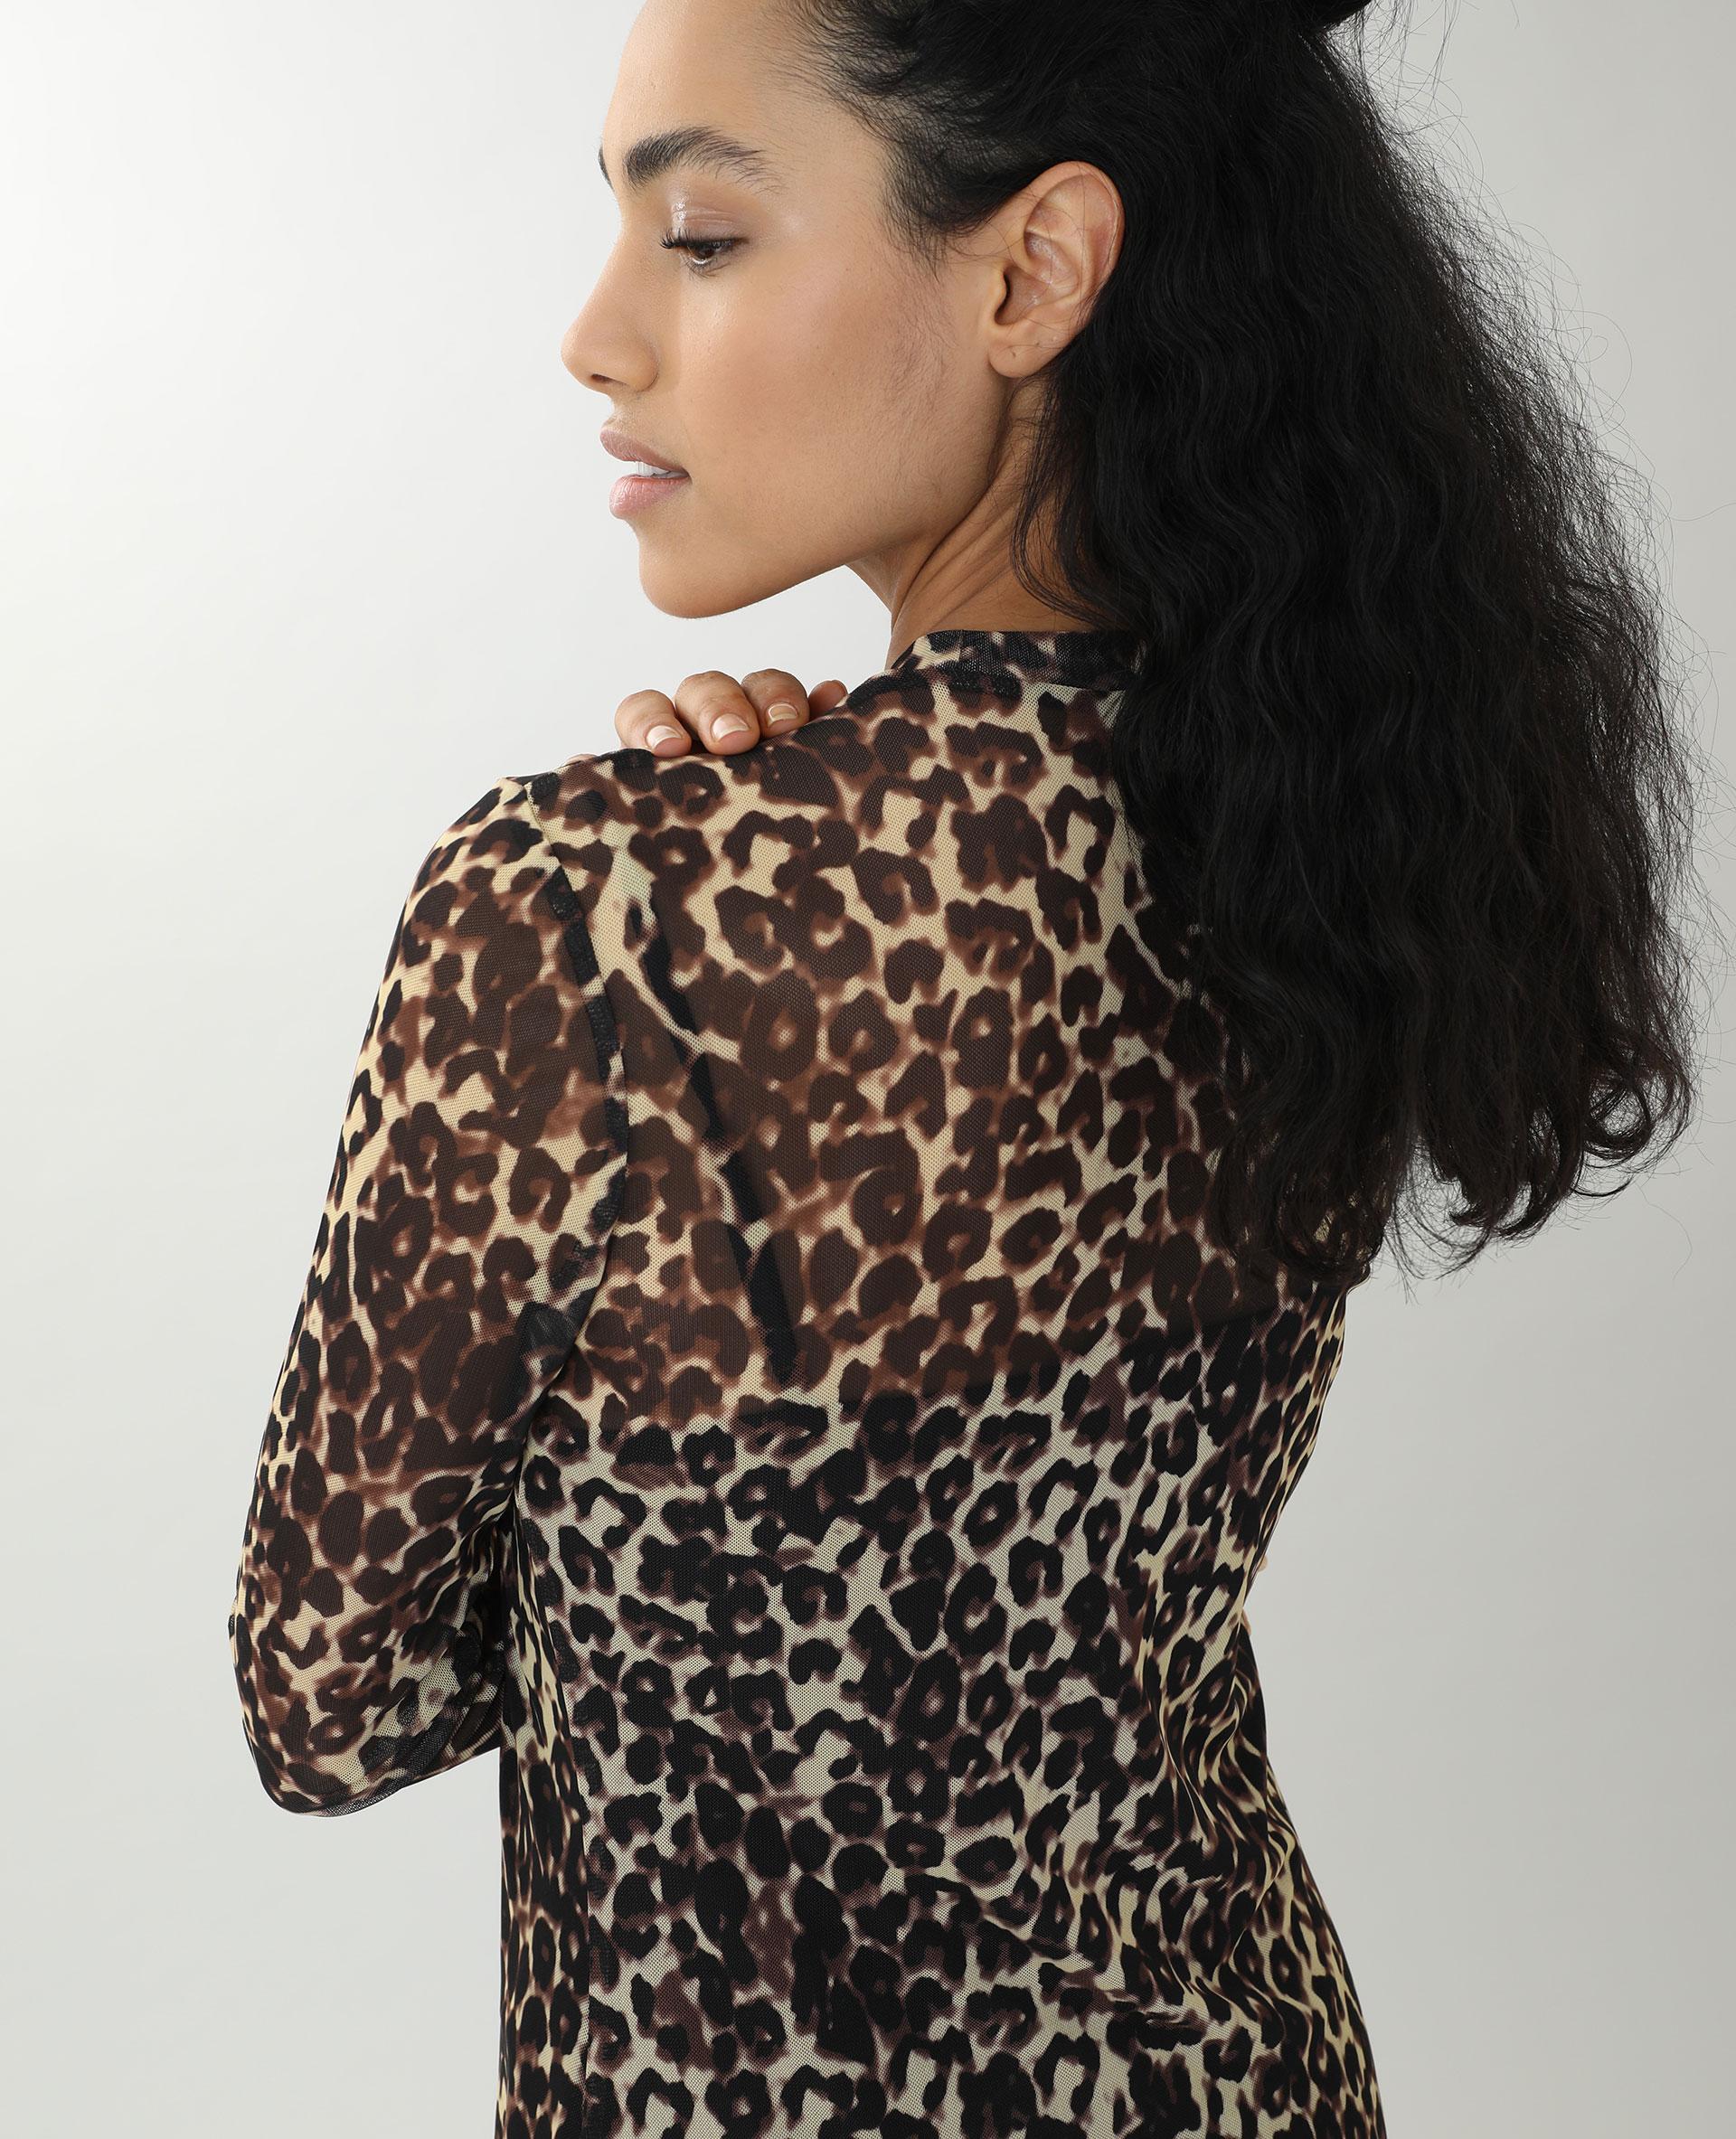 Robe transparente marron - Pimkie